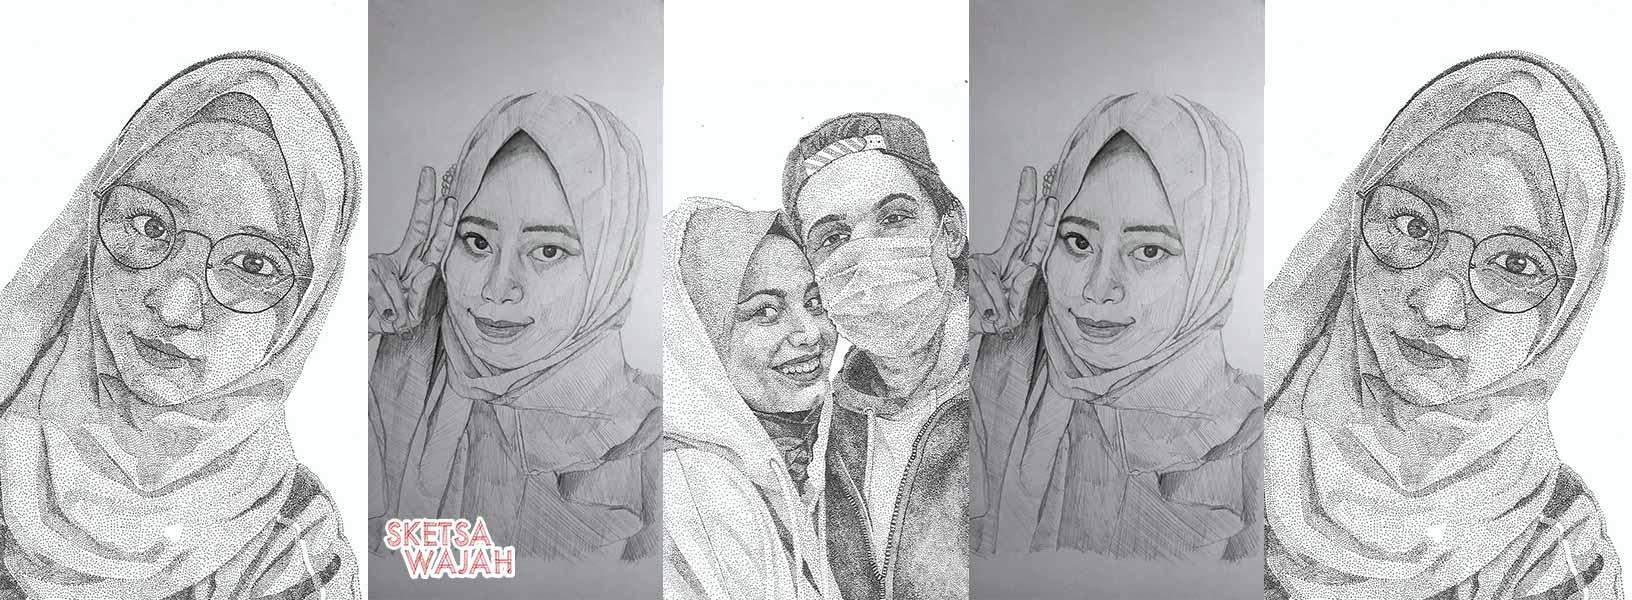 Karya Awiesome sketcher Sketsa Wajah